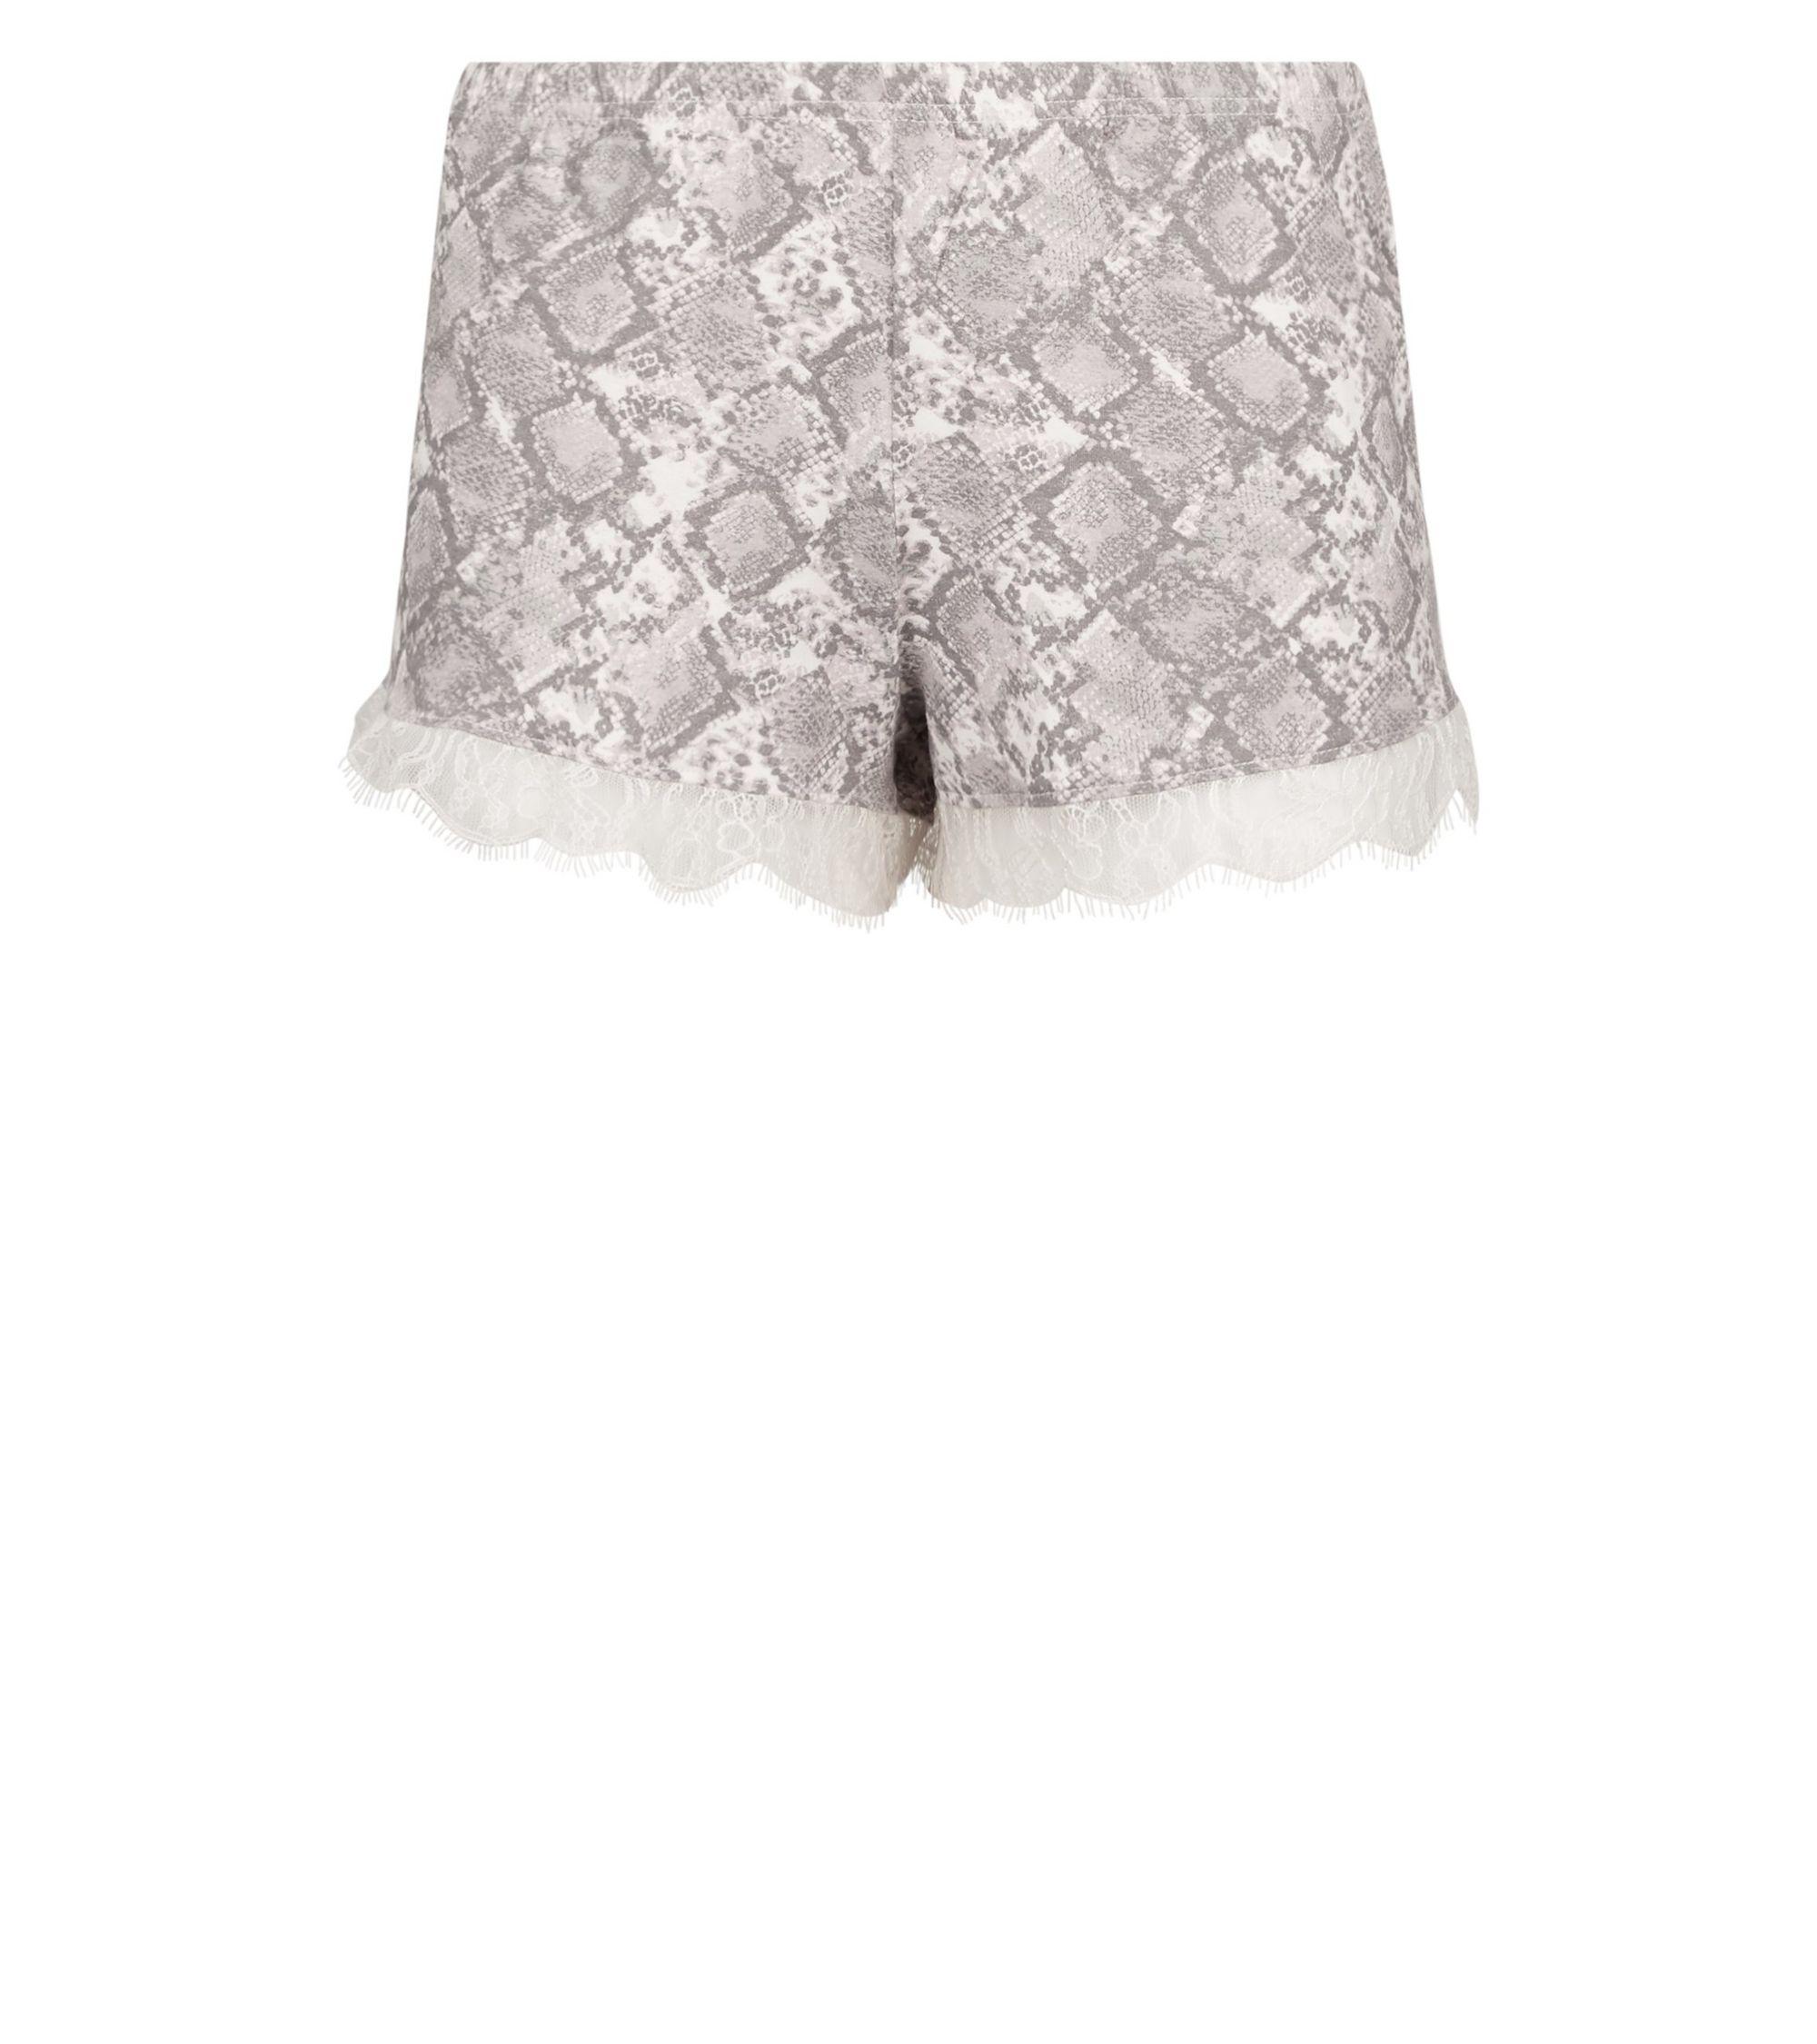 a1bd81bb30d6 New Look Pink Snake Print Lace Trim Pyjama Shorts at £6.99 | love ...